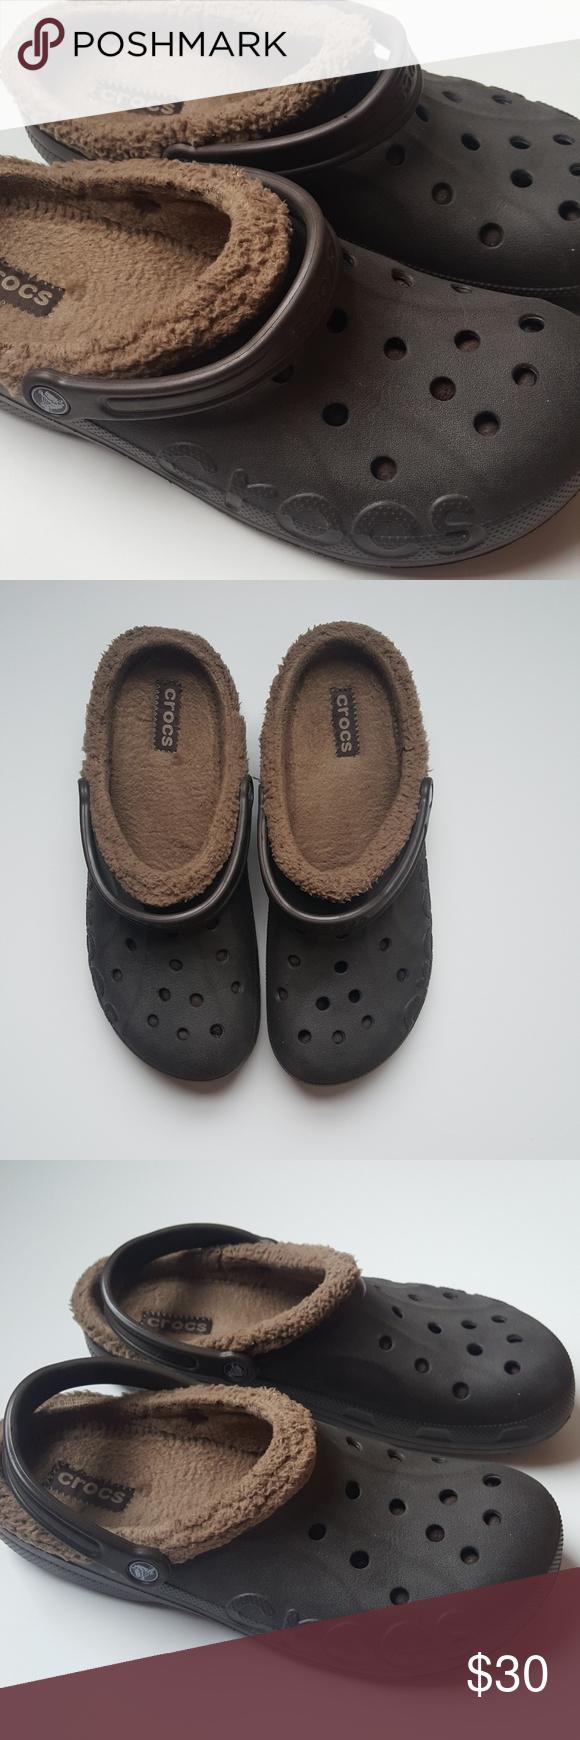 Crocs Clog Classic Lined Clog Crocs   My Posh Picks   Pinterest   Crocs scarpe   540621